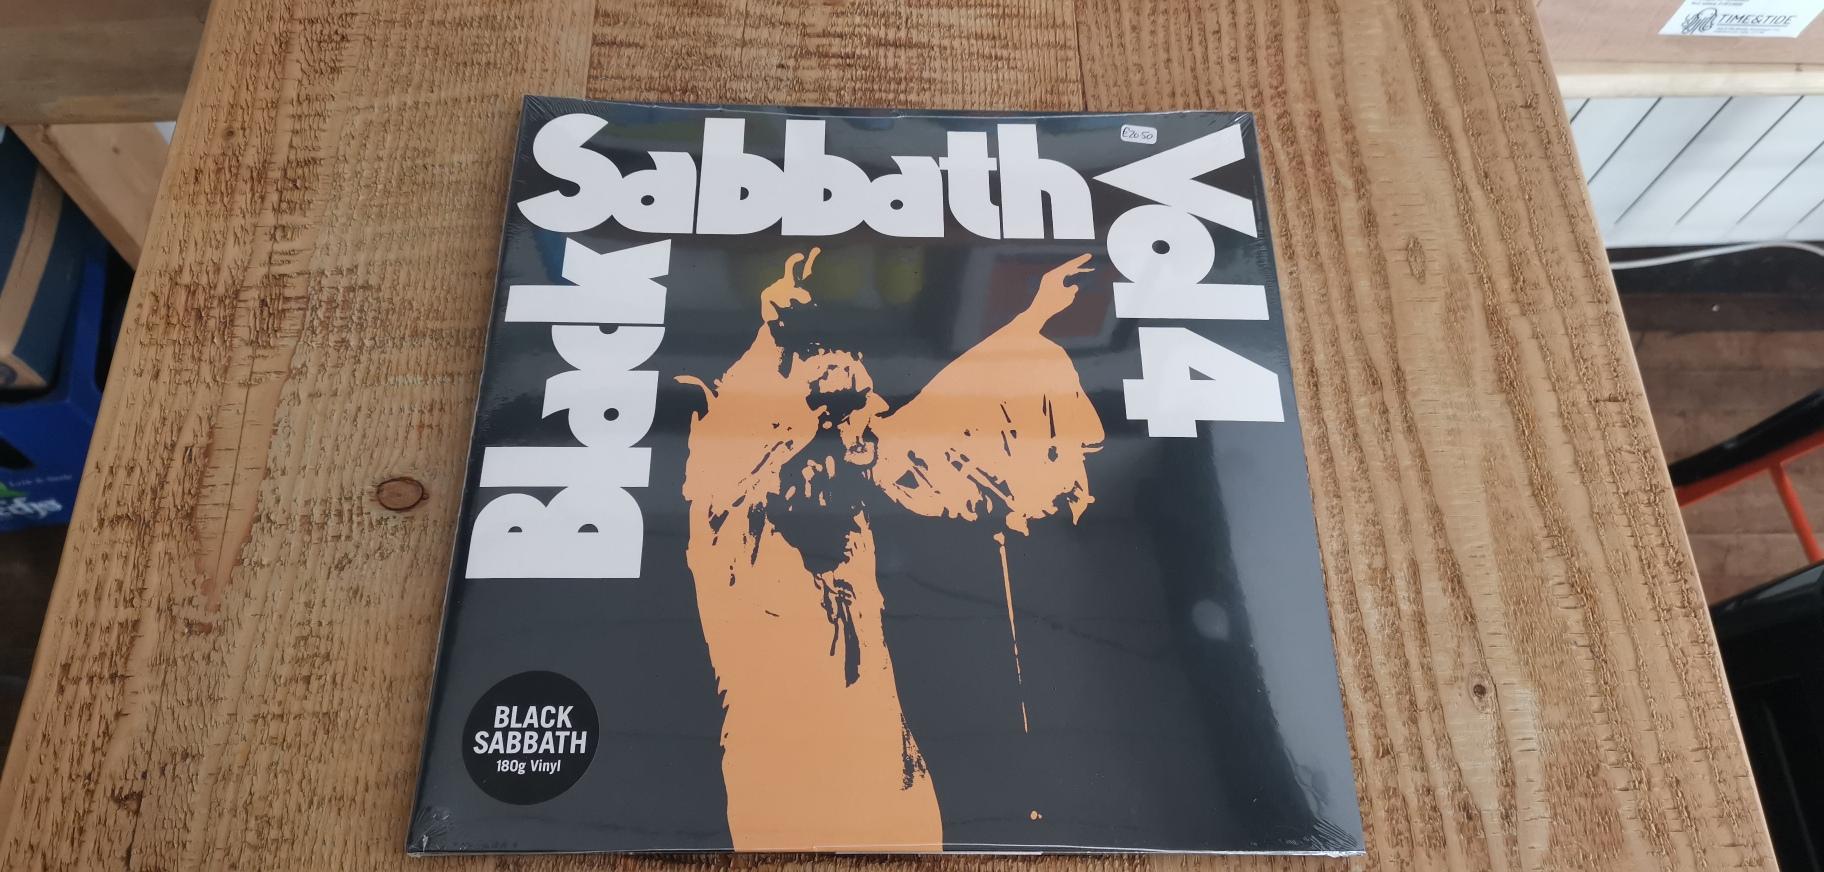 Black Sabbath - Vol 4 (Remastered 180g Vinyl)